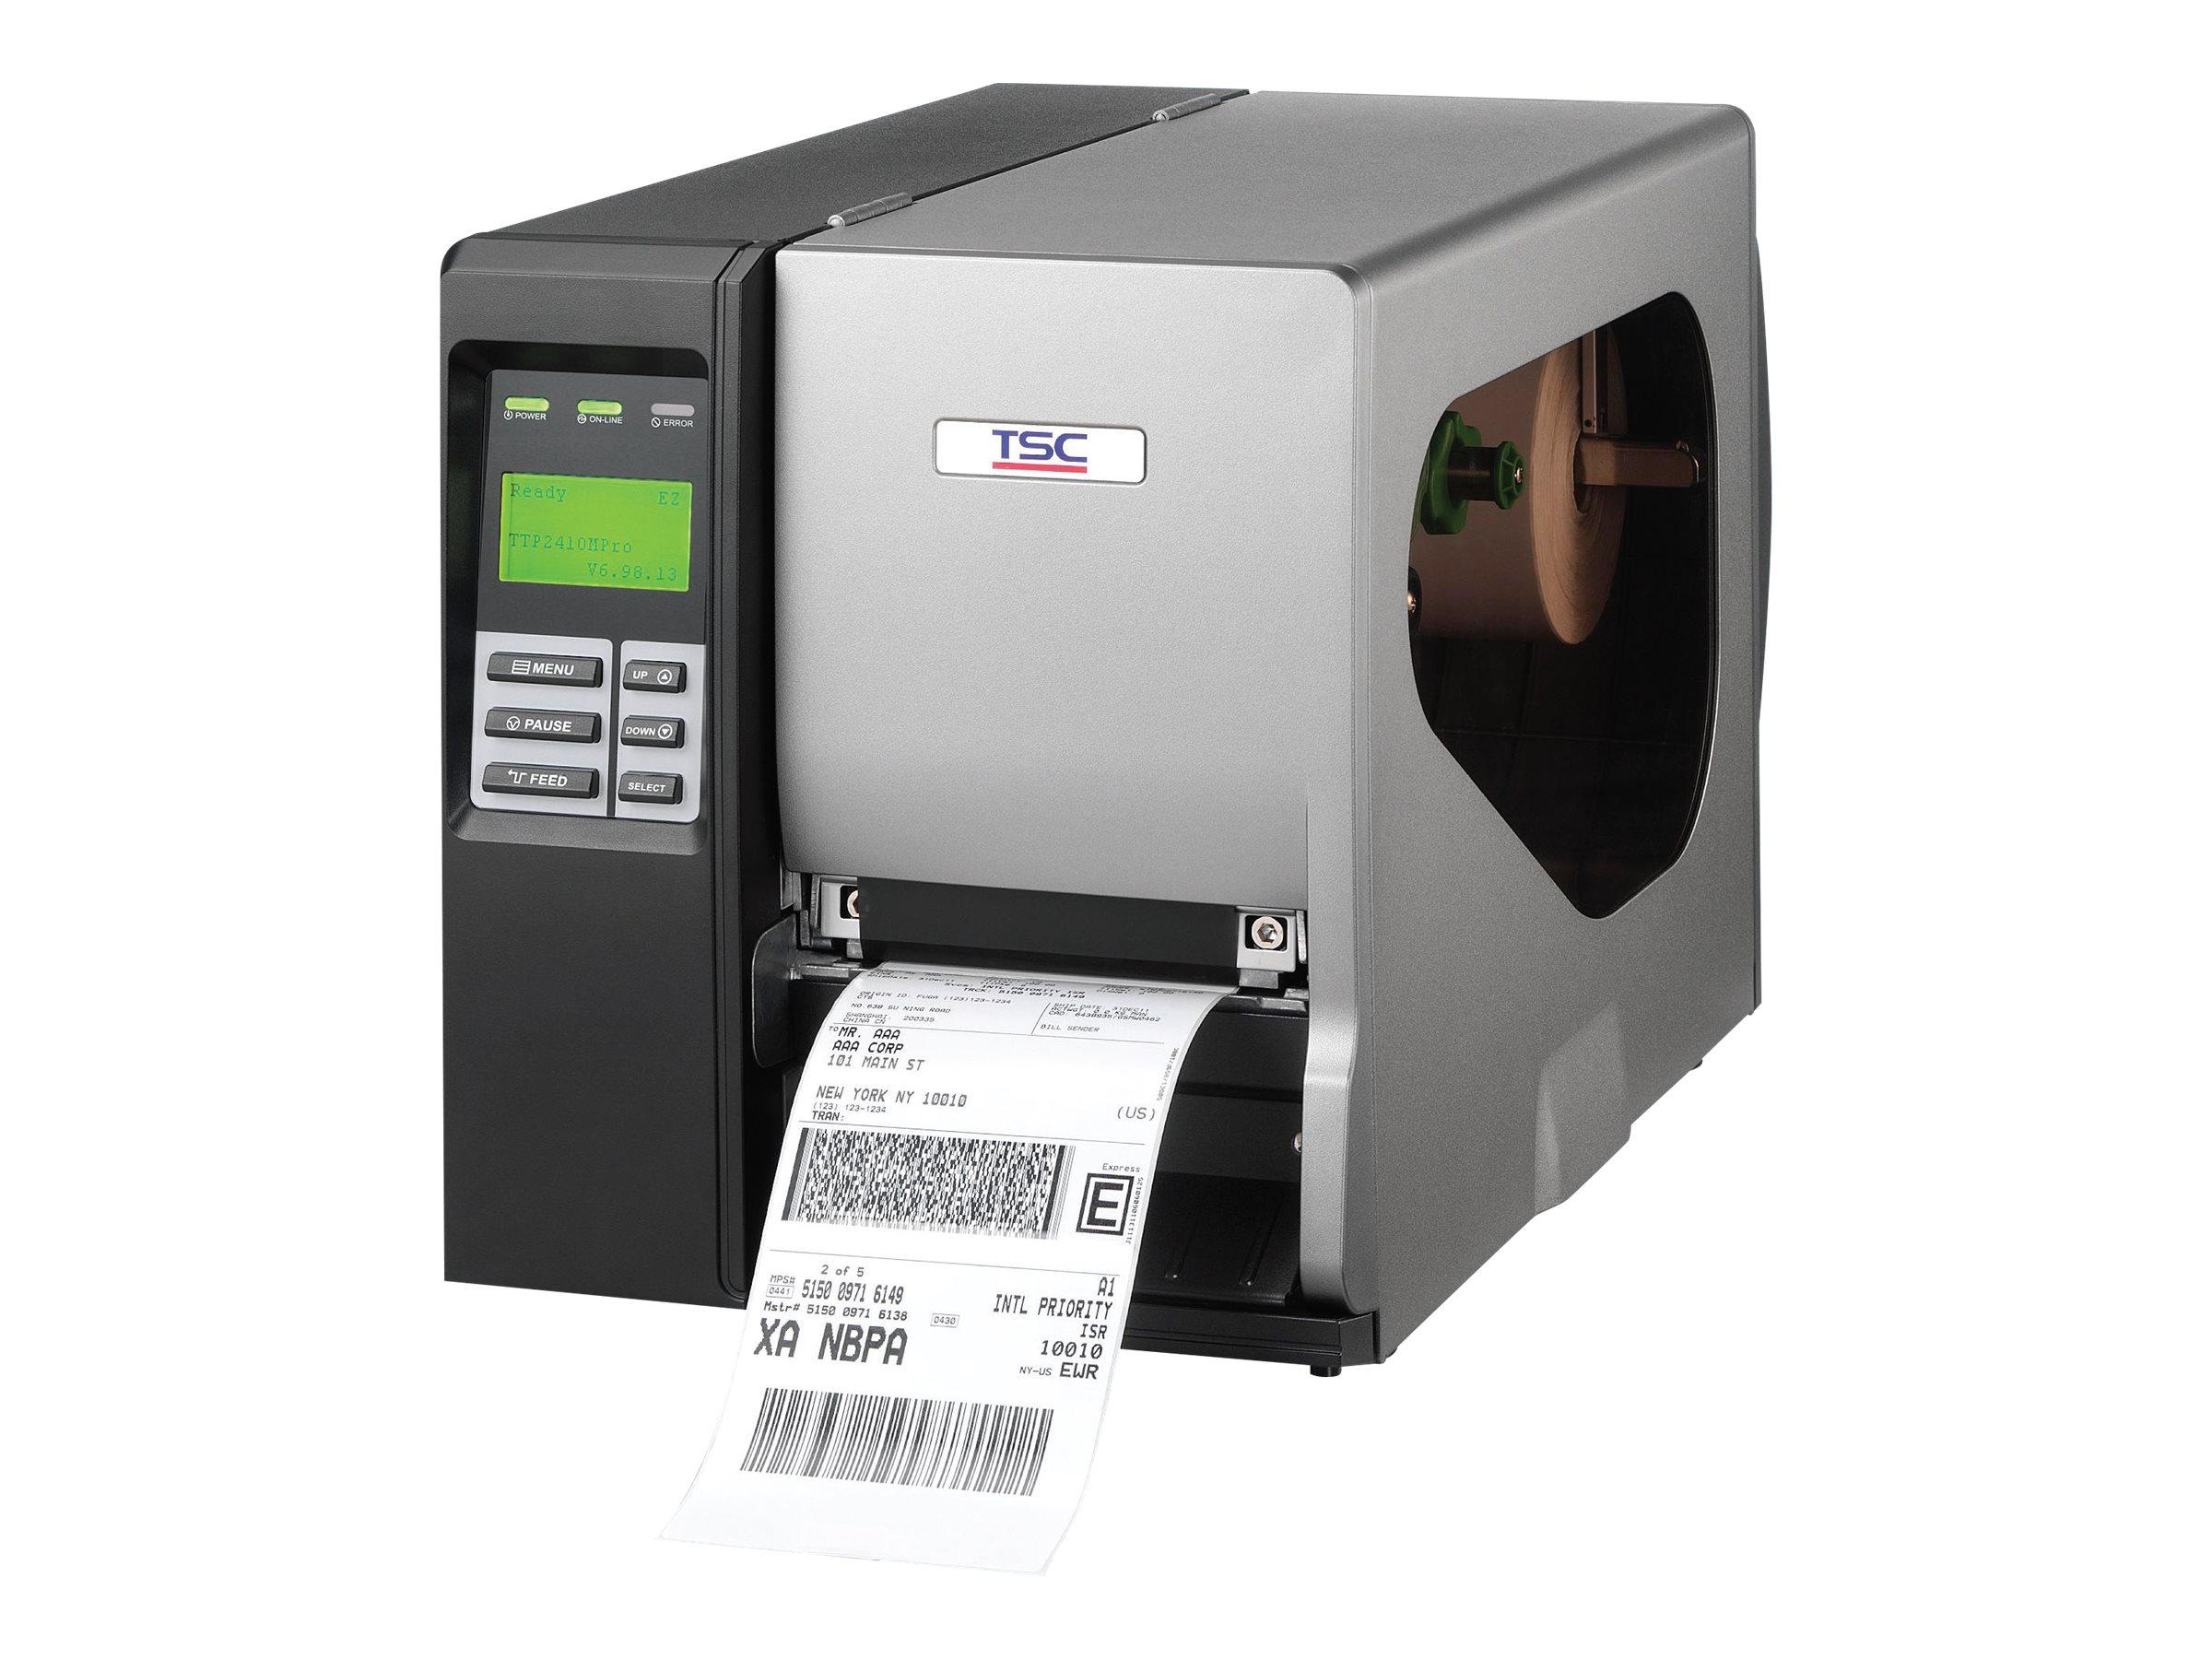 TSC TTP-246M Pro - Etikettendrucker - TD/TT - Rolle (11,8 cm)